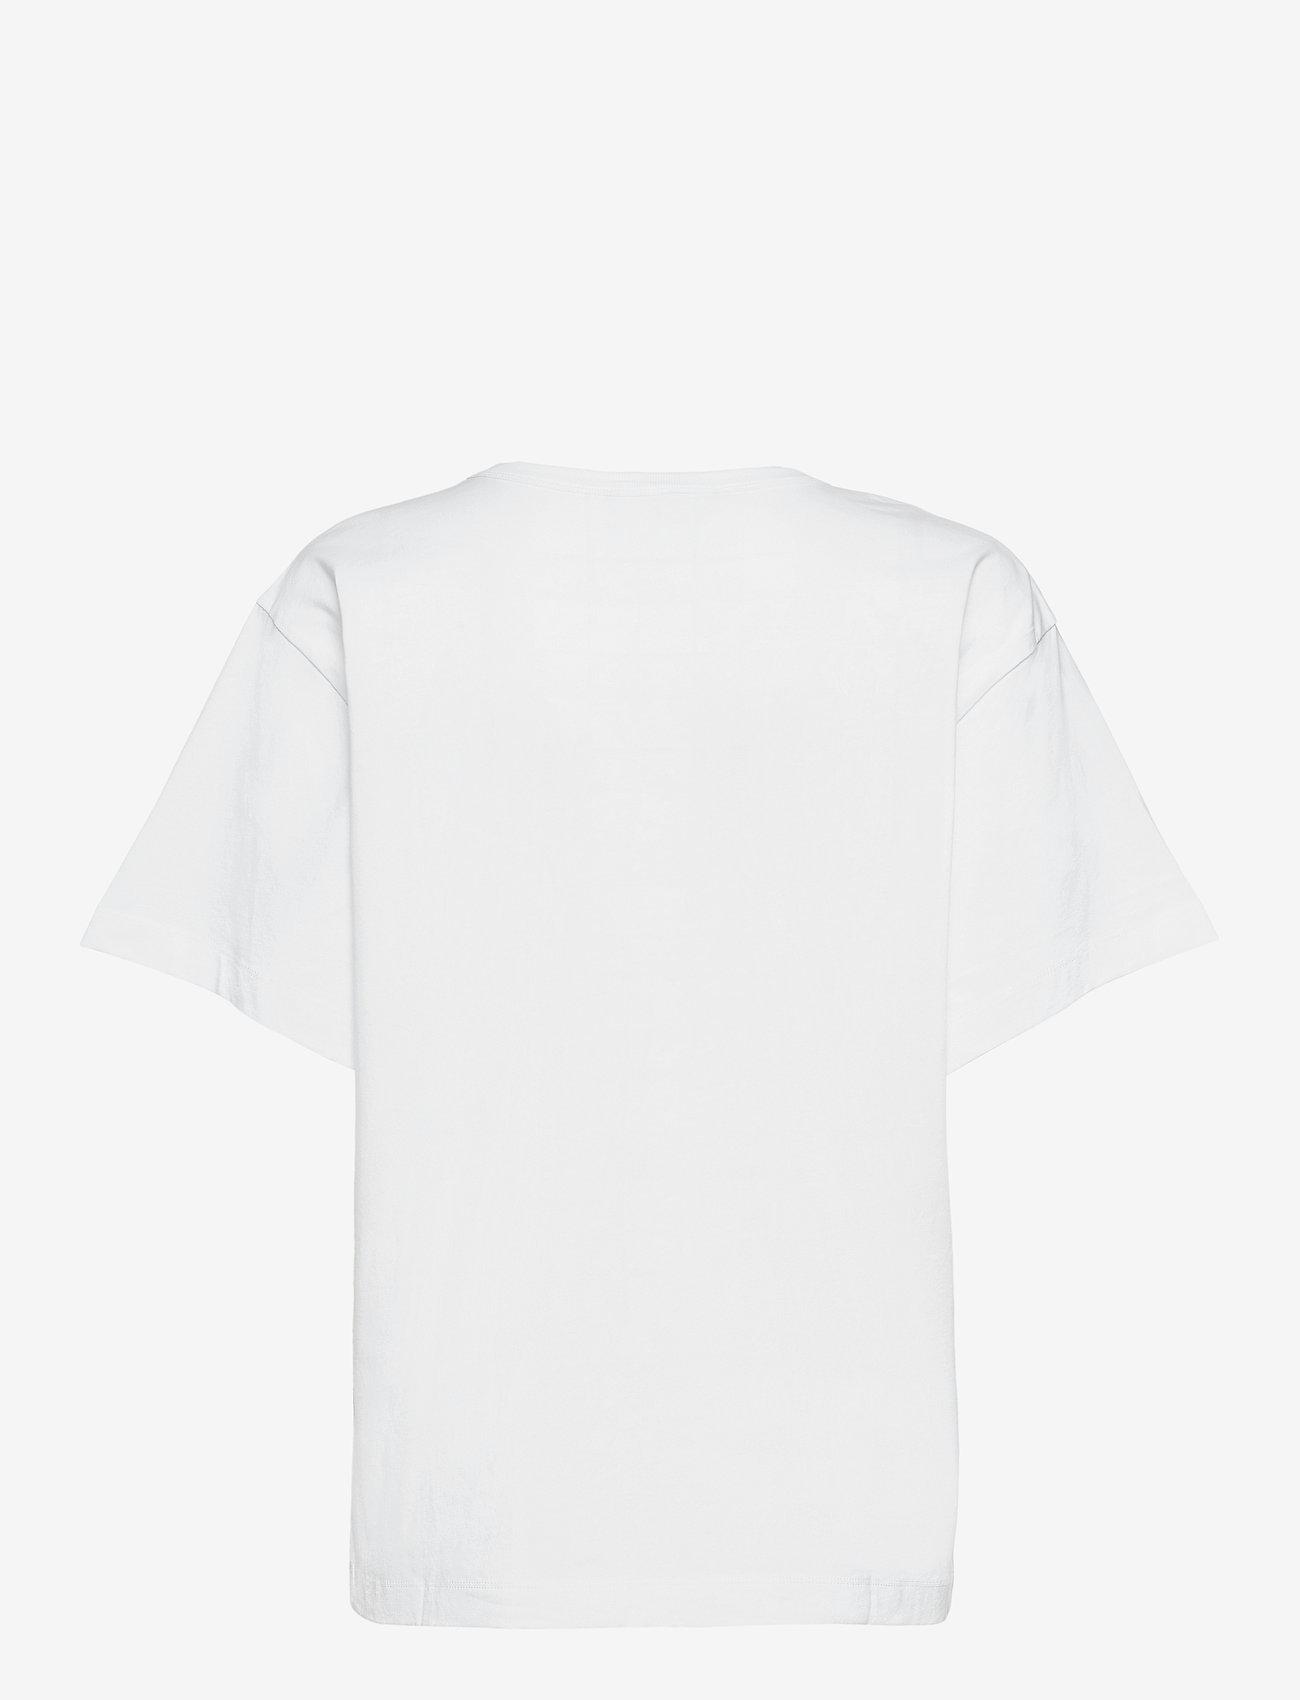 Boutique Moschino - APPLES T-SHIRT - t-shirts - white fantasy print - 1